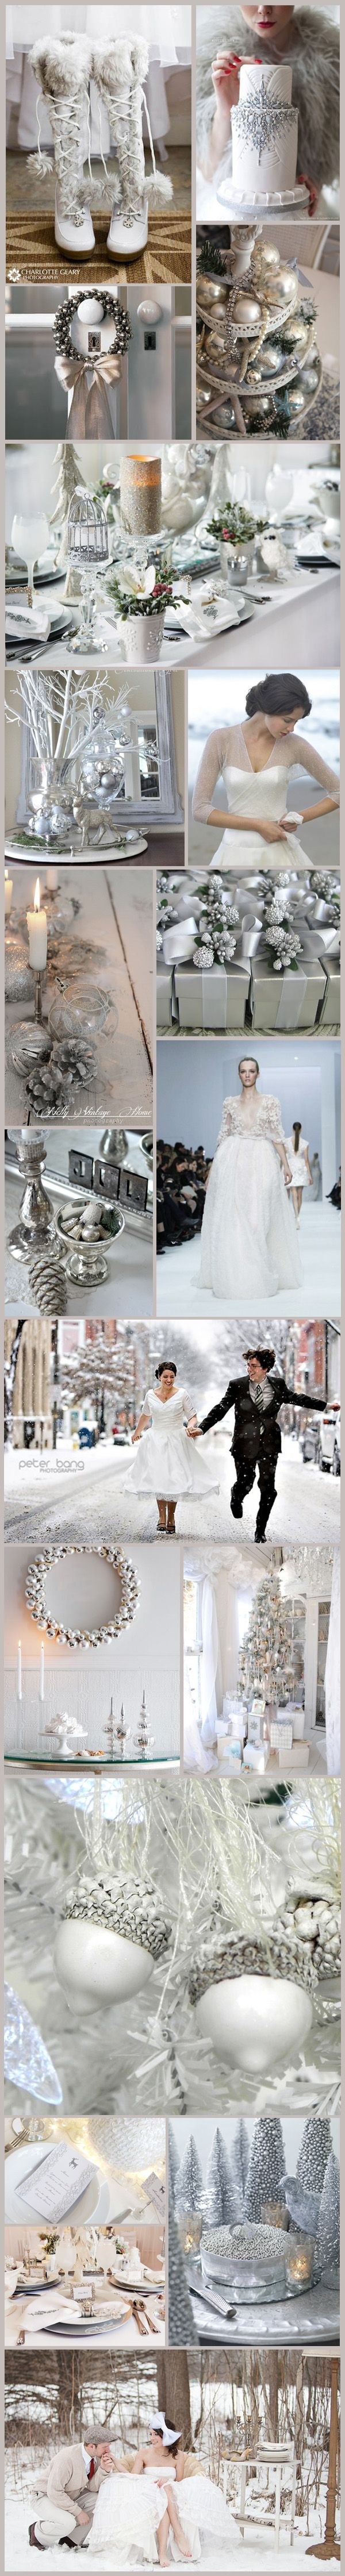 Winter Wedding Inspiration!